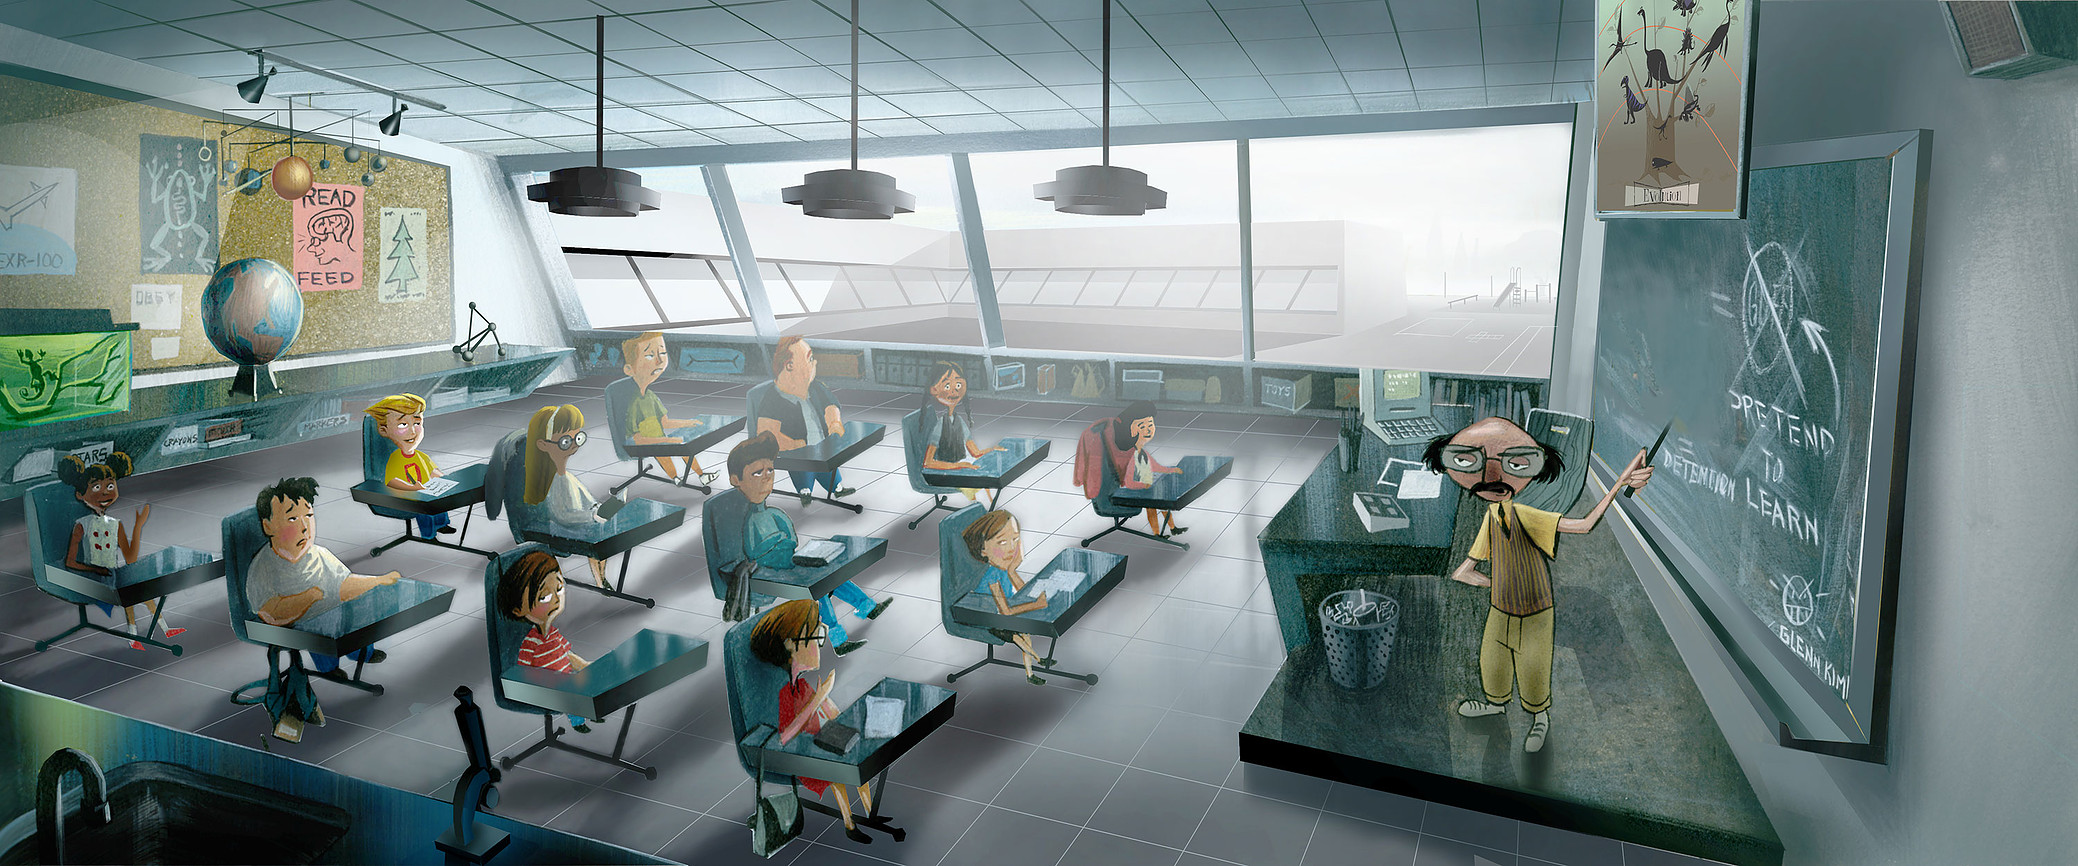 glenn-kim-dashs-classroom